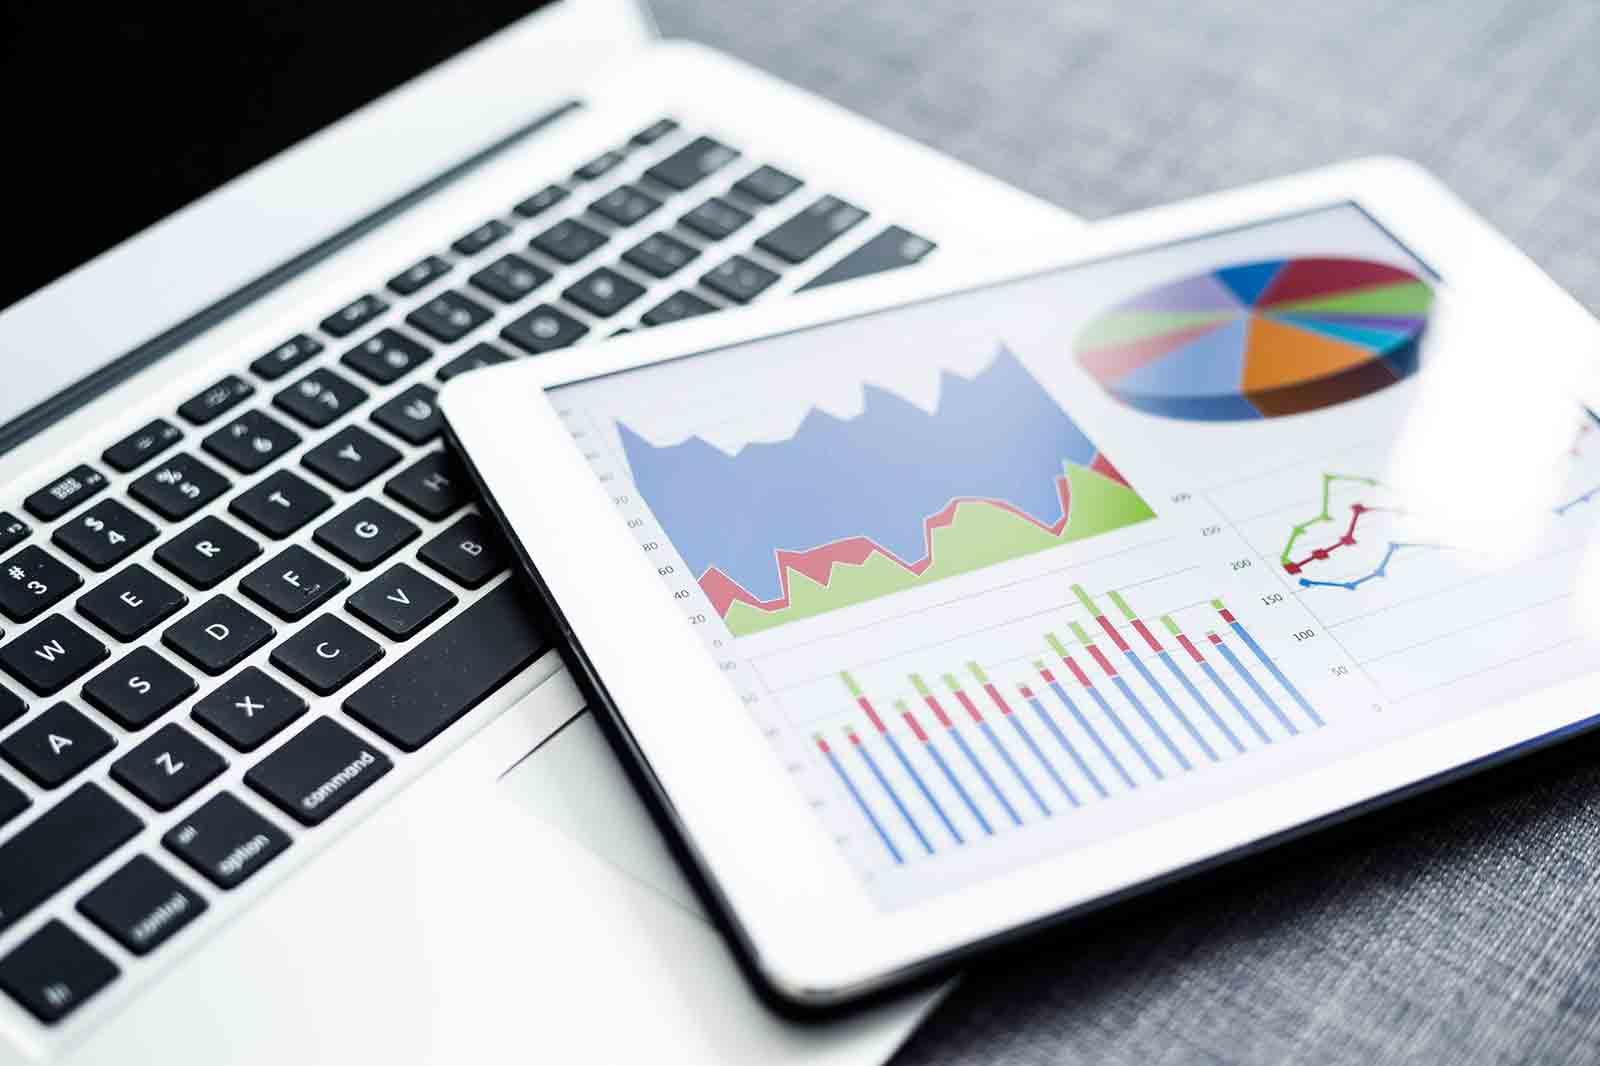 Custom Business Mobile and Desktop Apps